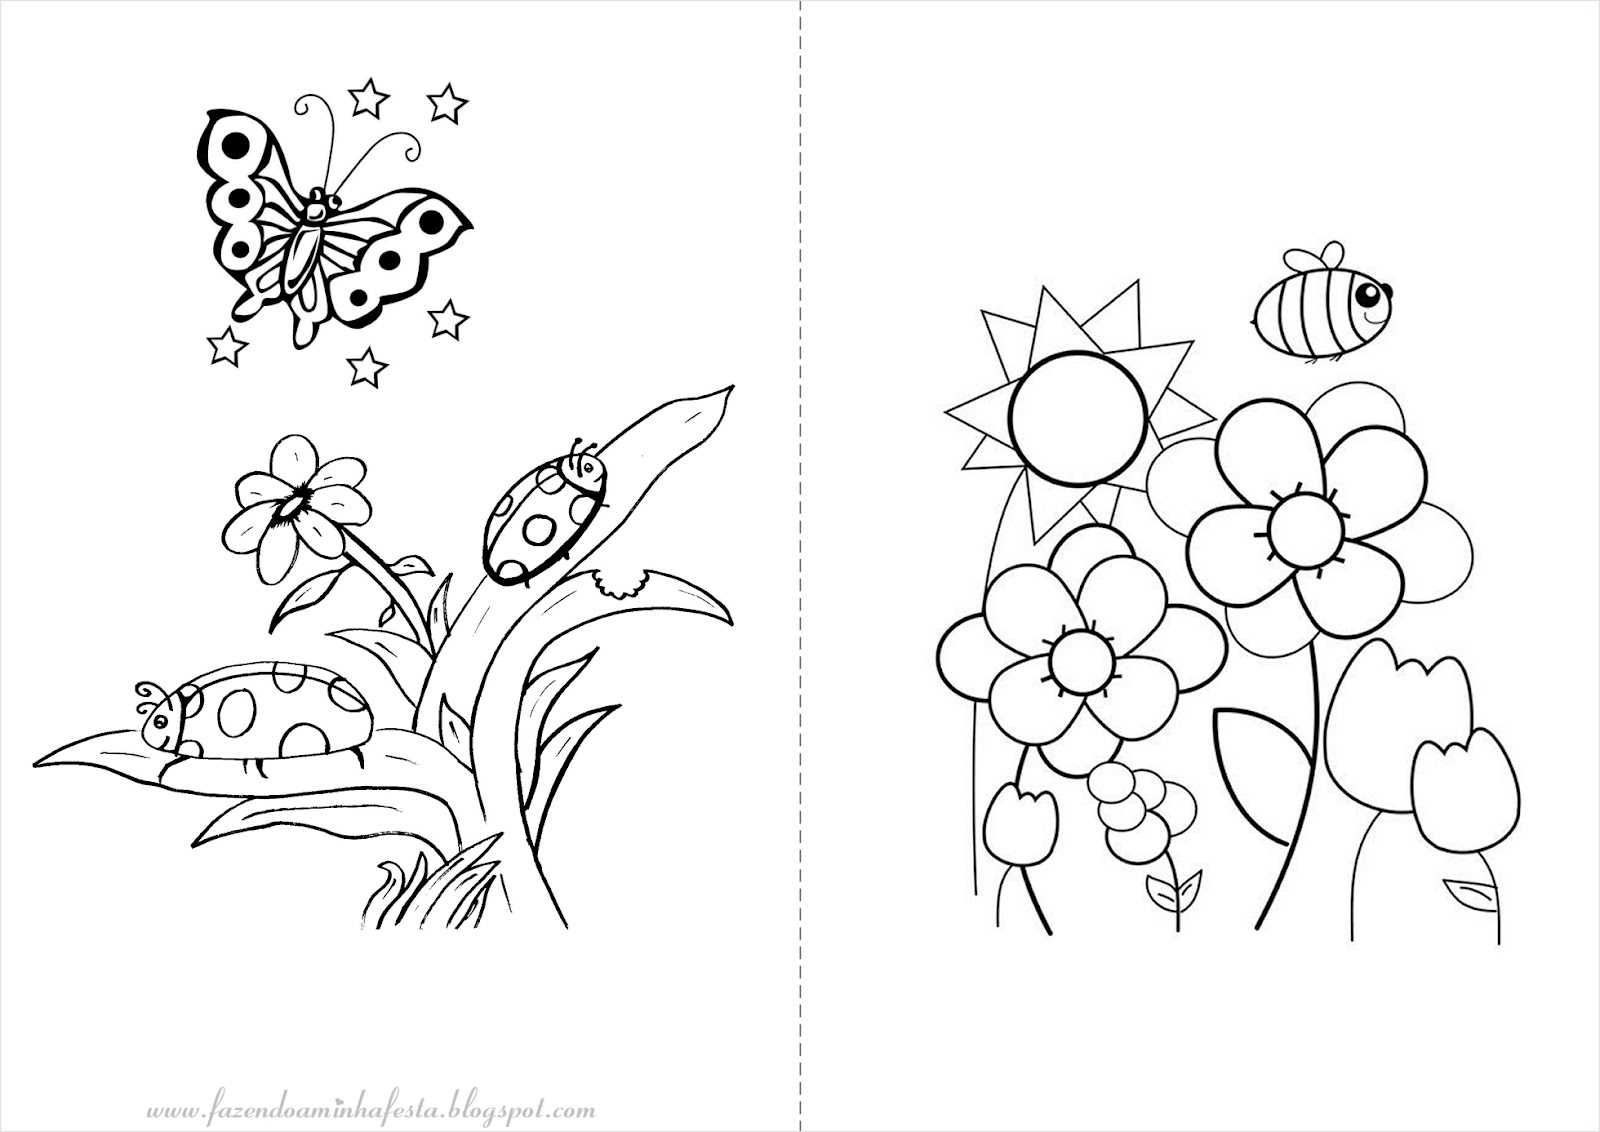 imagens de jardim para colorir Minha Festa para Colorir Jardim